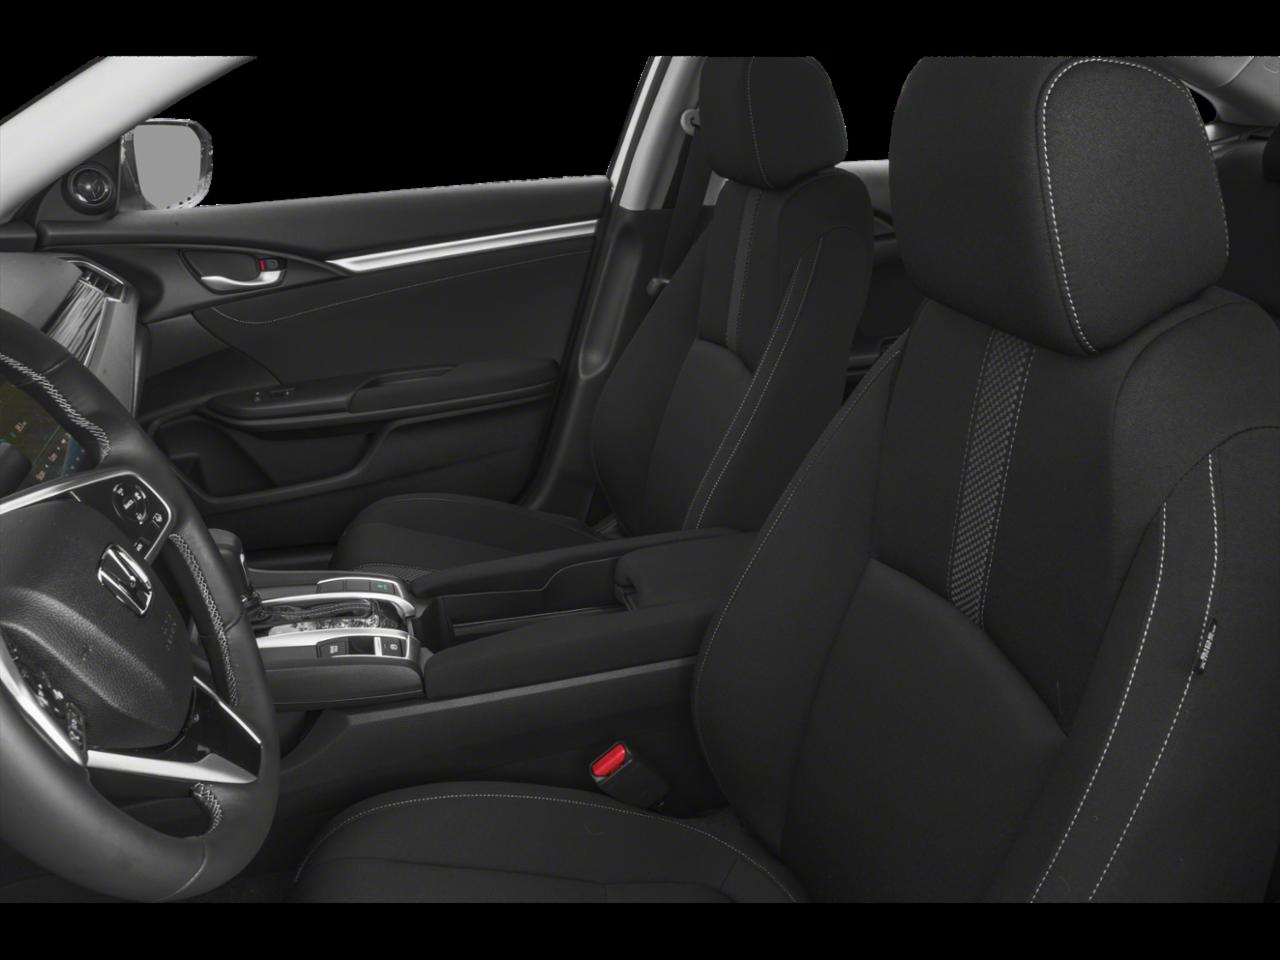 image-5 2020 Honda CIVIC